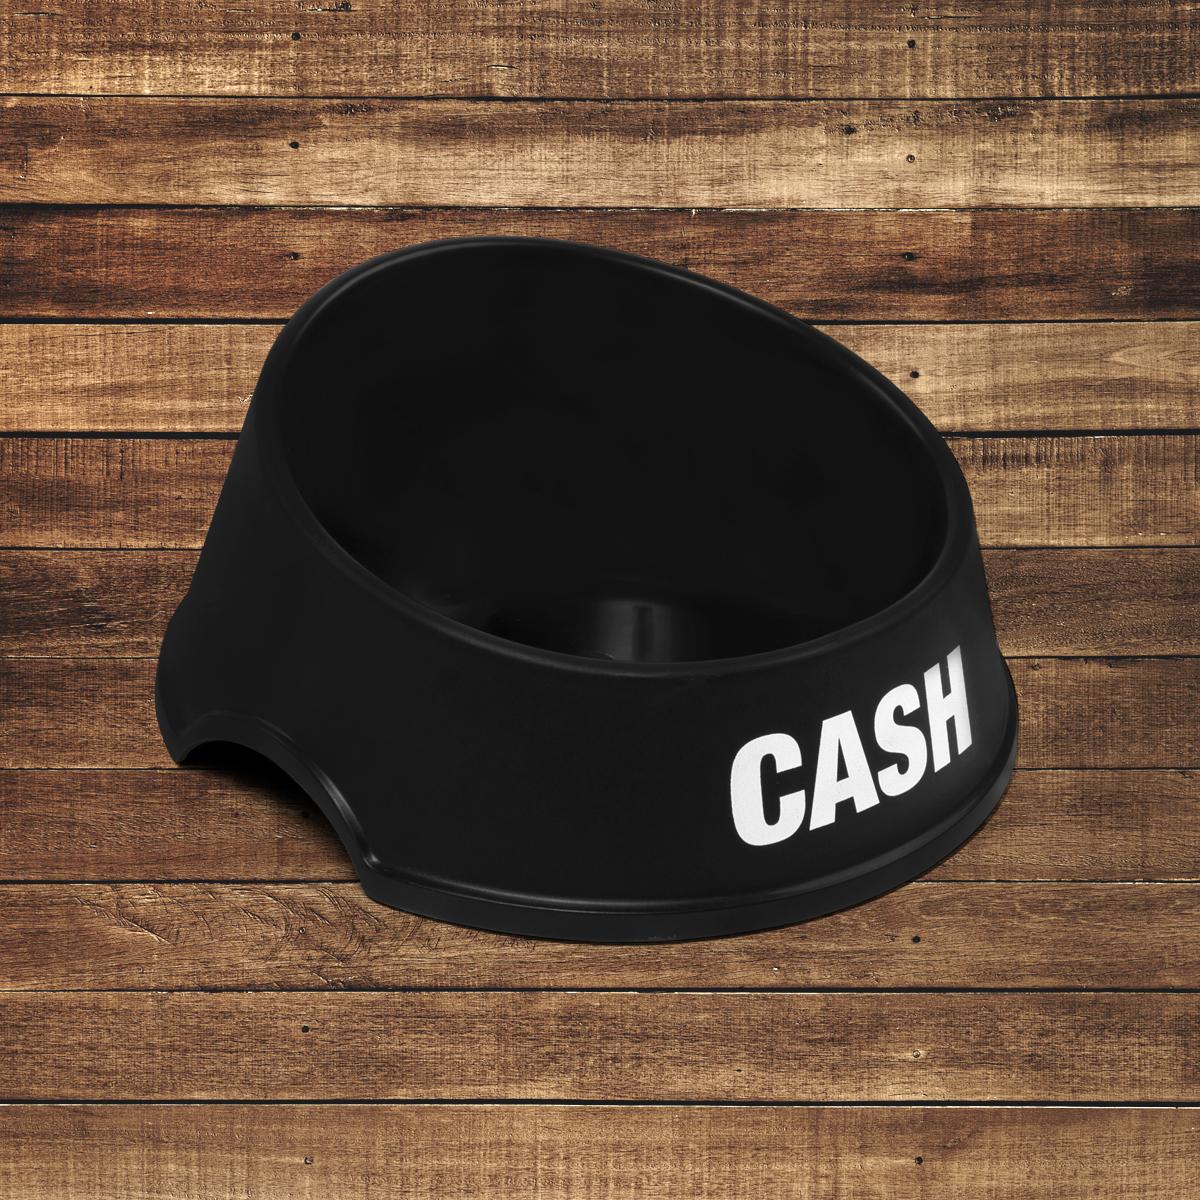 CASH Dog Bowl